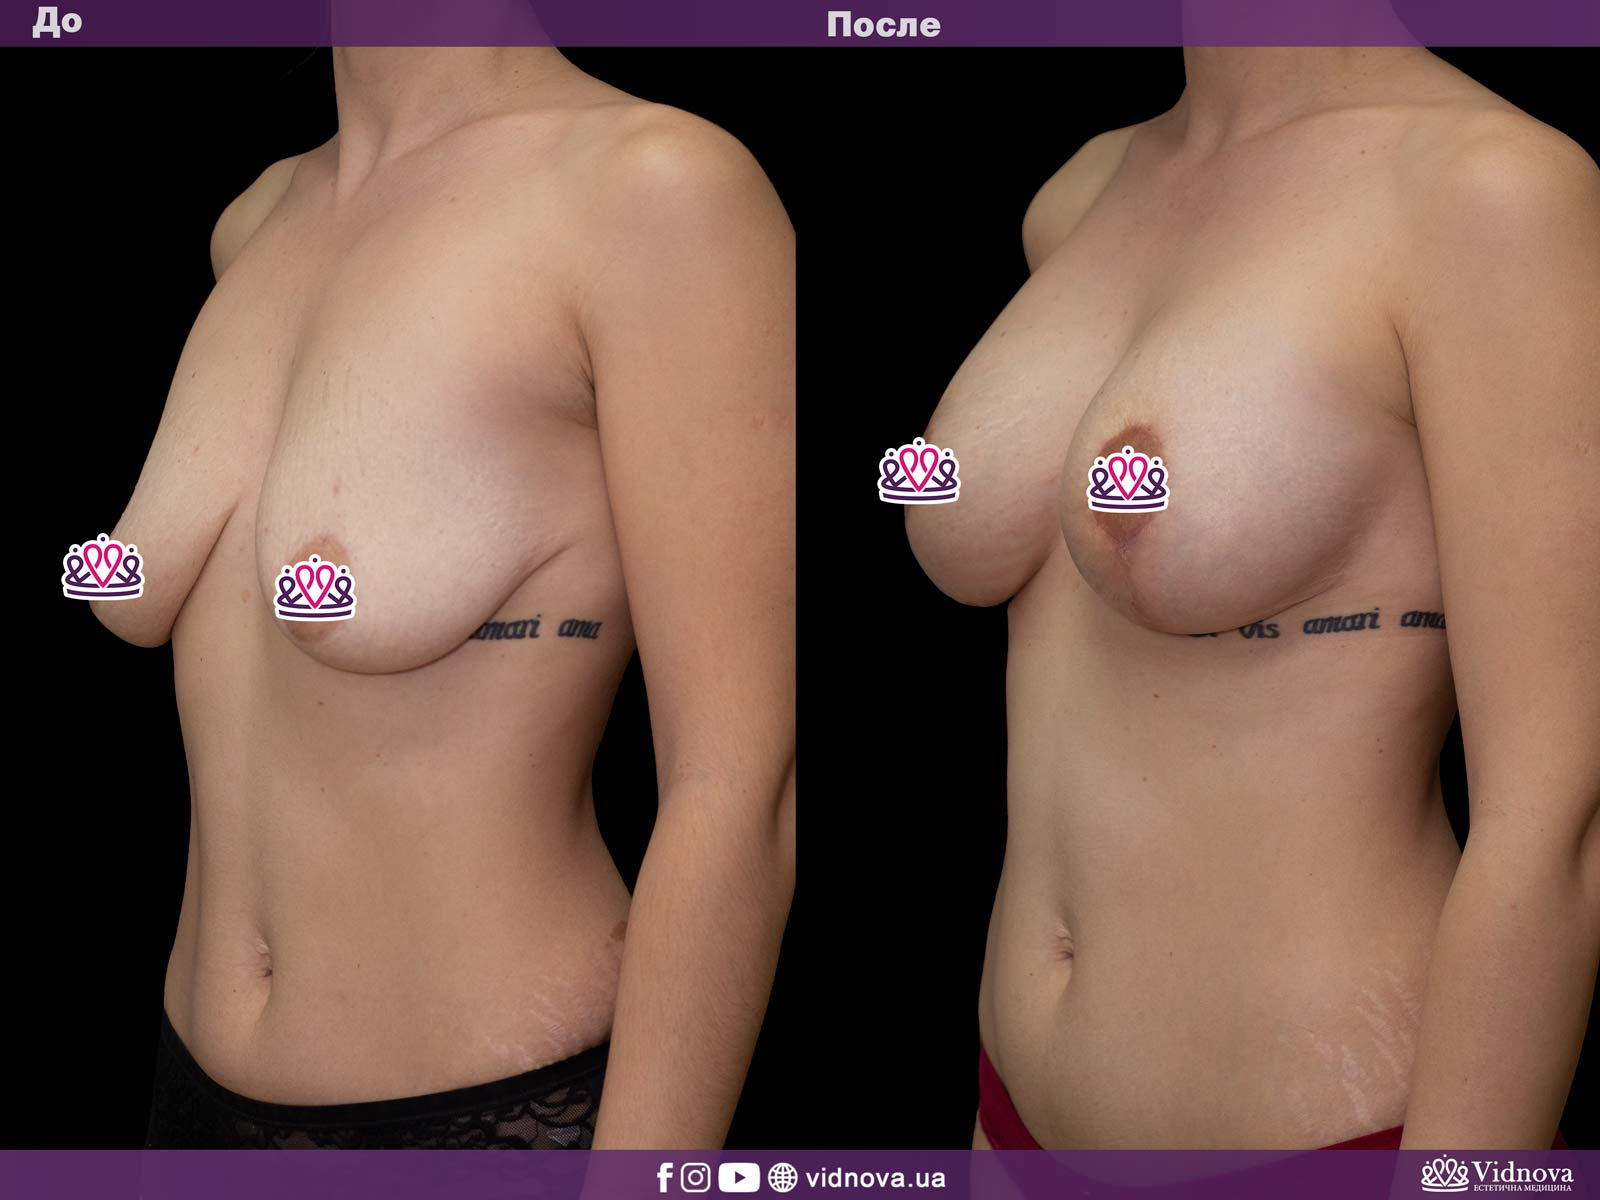 Подтяжка груди: Фото ДО и ПОСЛЕ - Пример №14-2 - Клиника Vidnova